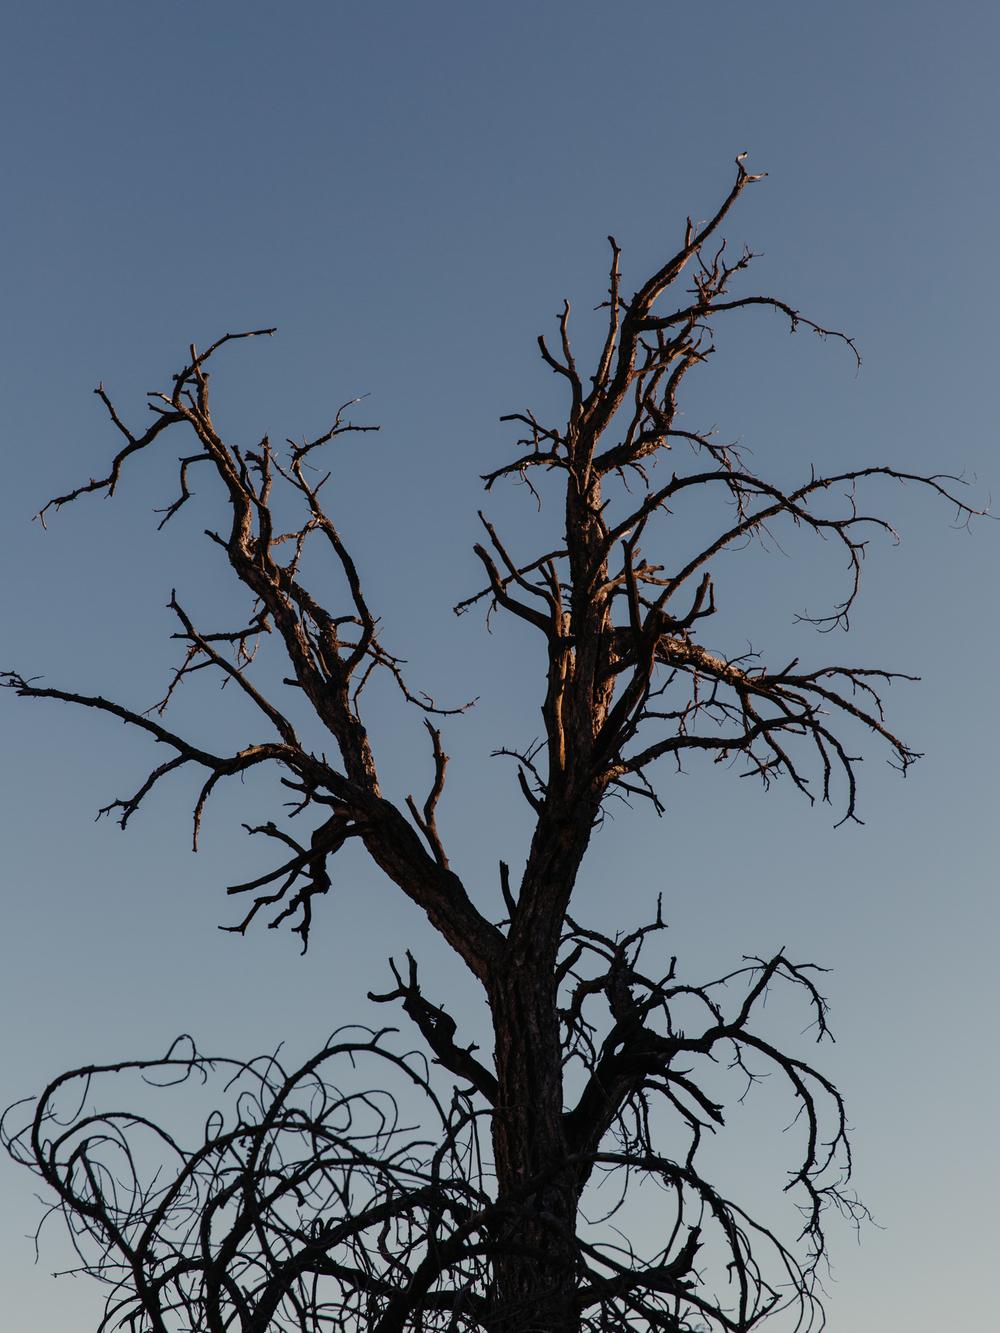 JOSHUA-TREE_Low-Res-22.JPG